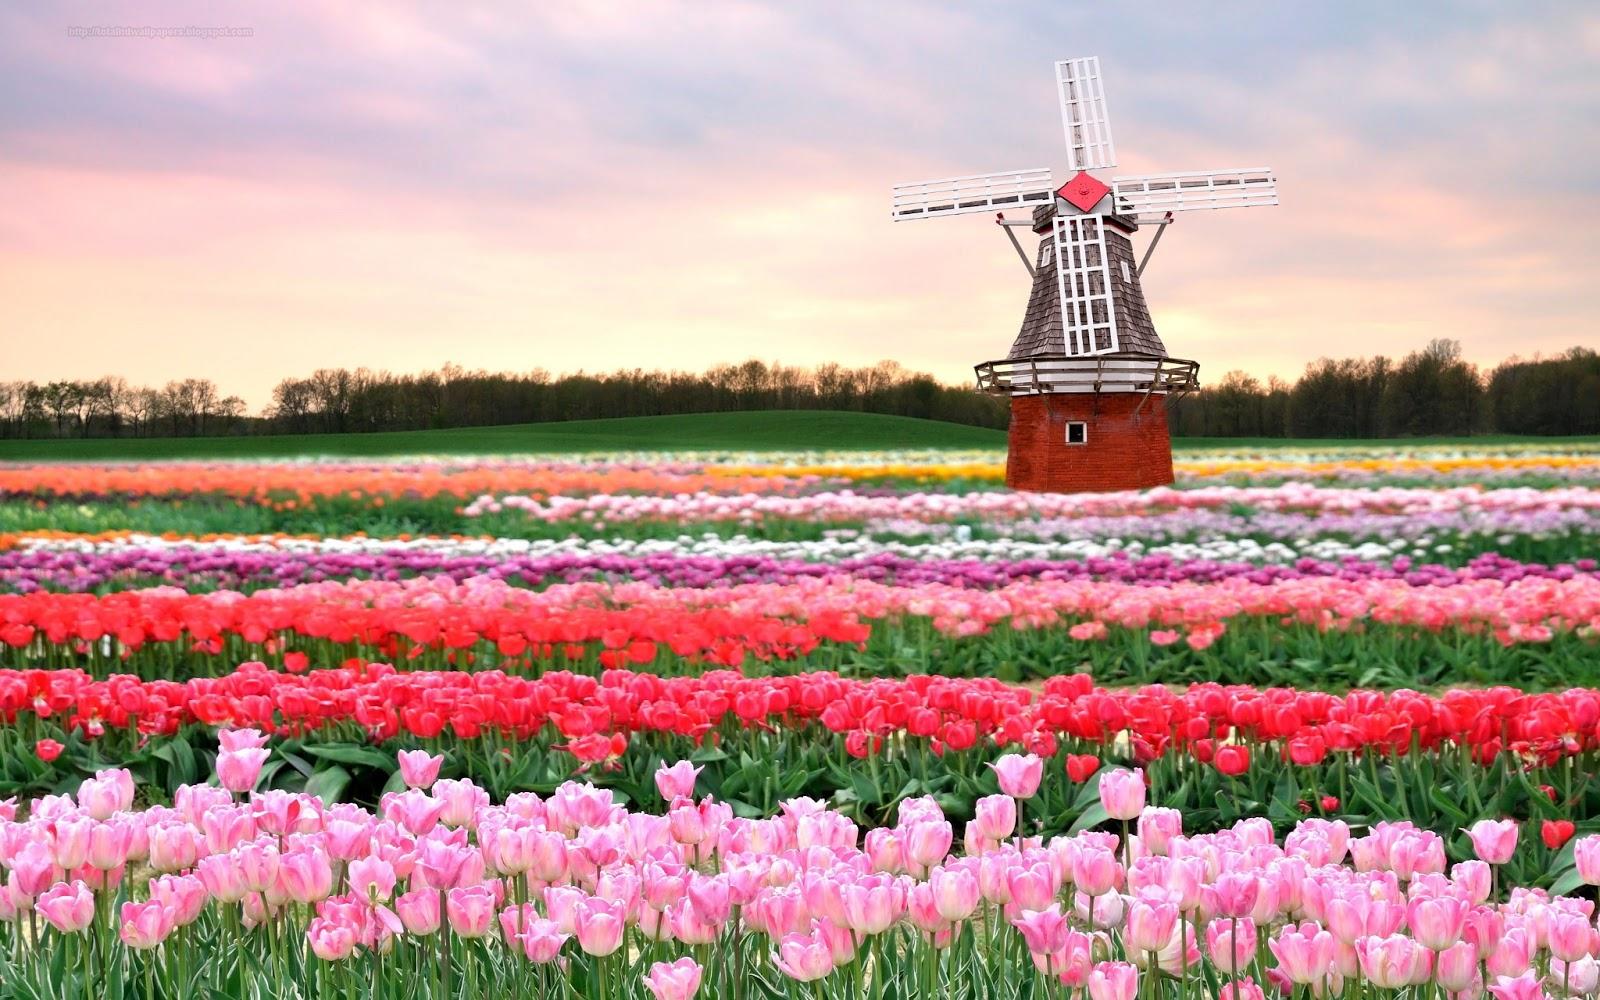 Iphone Wallpaper: Tulip Wallpapers Hd